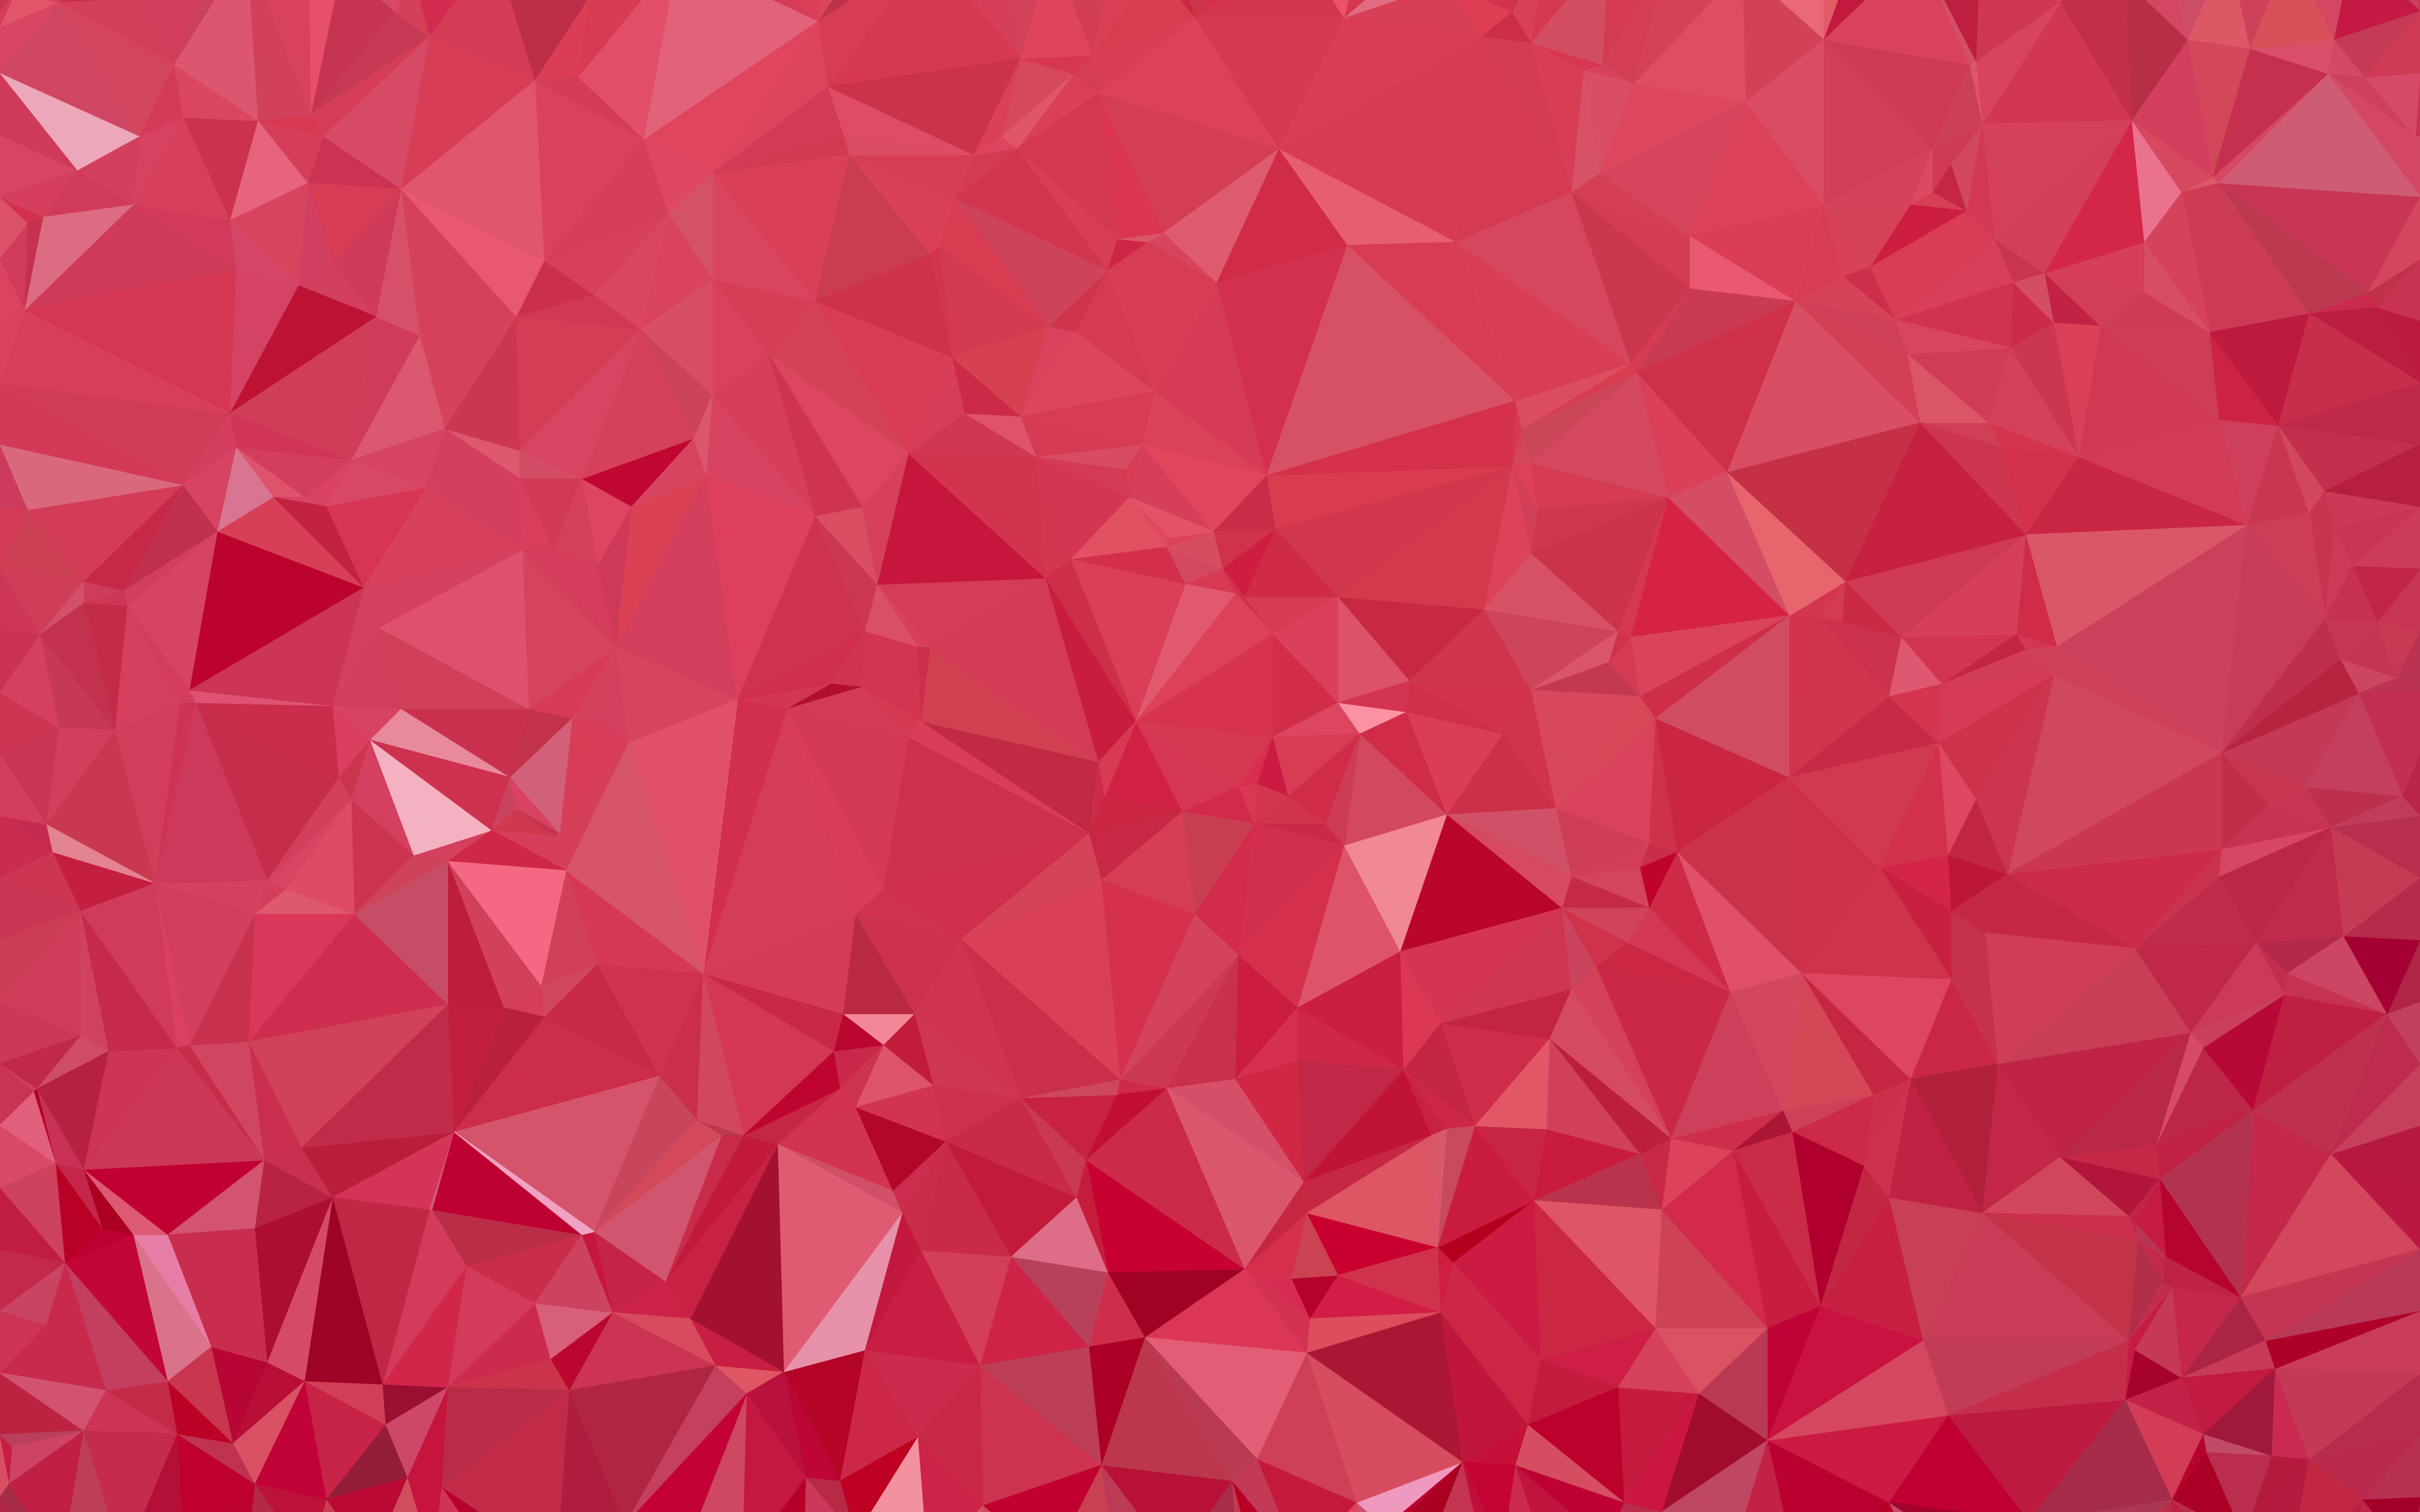 shape-polygon-triangle-geometric-mw.jpg